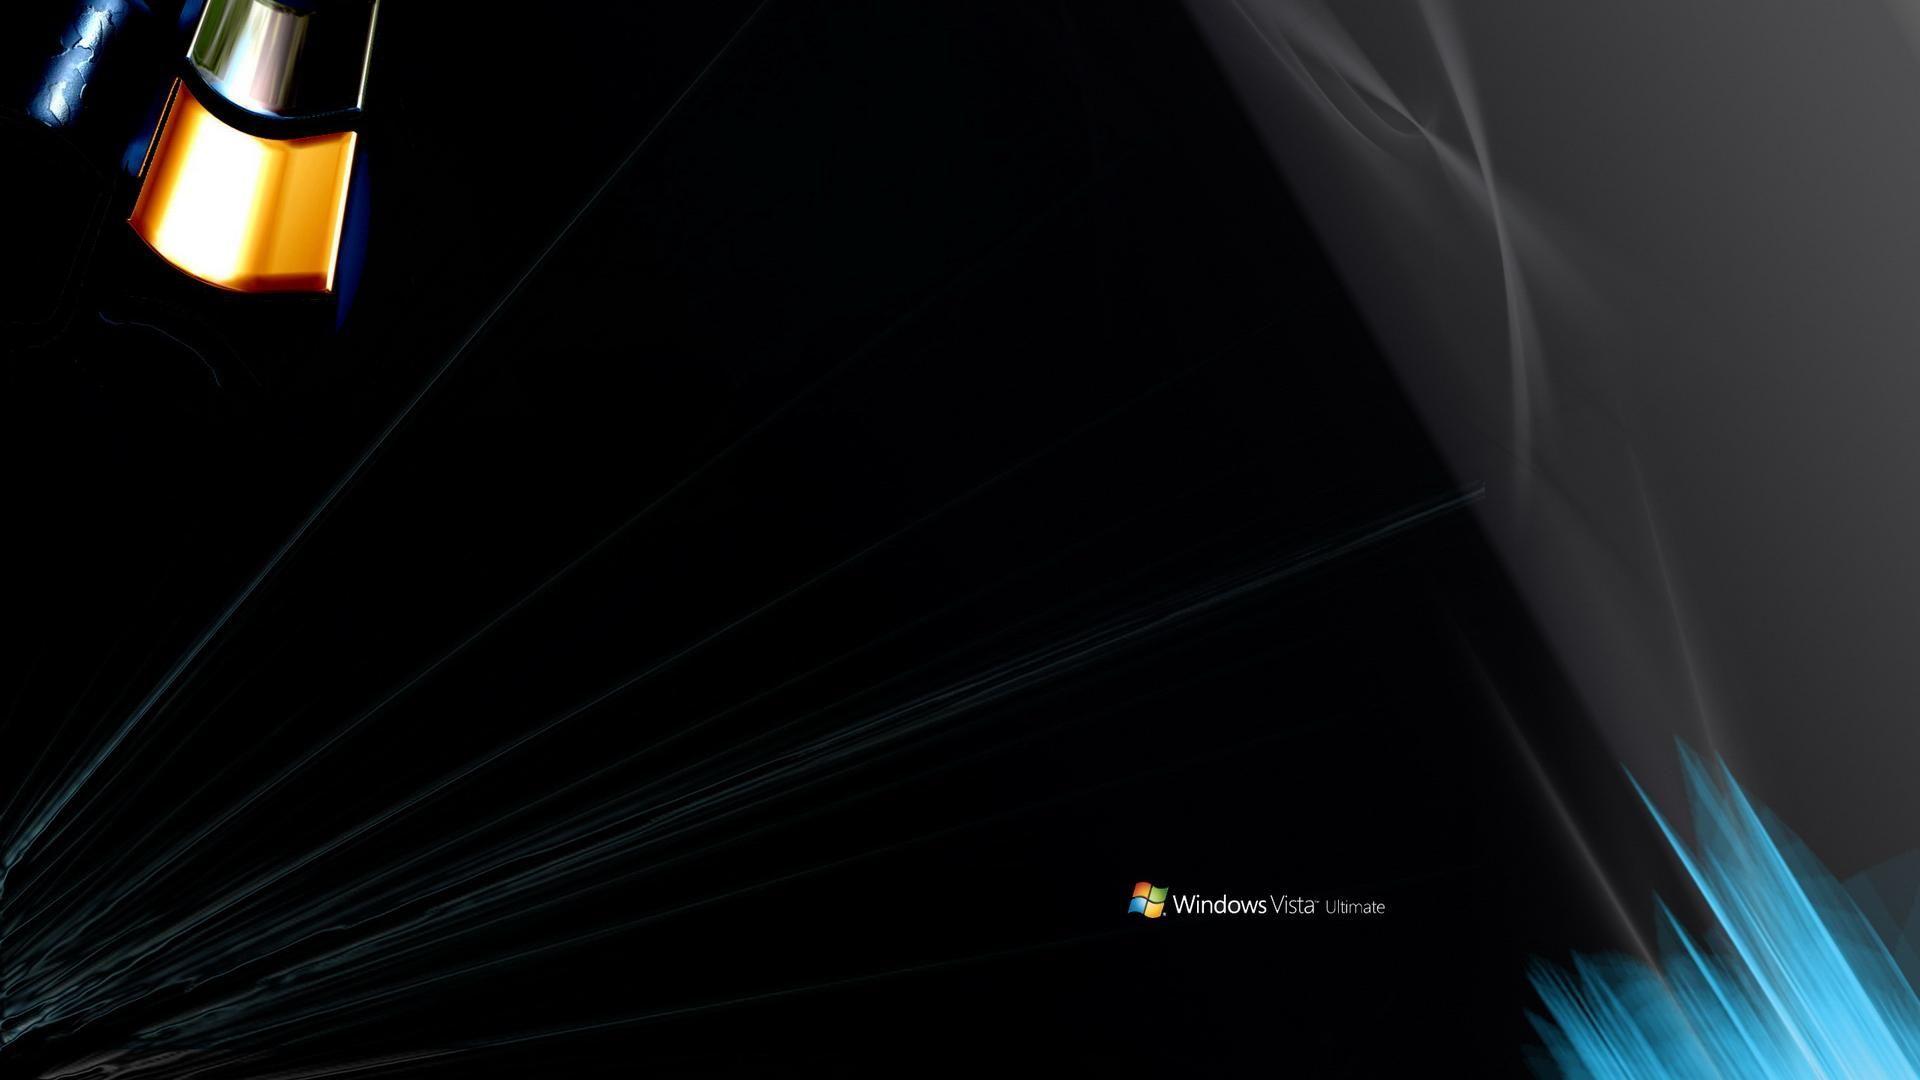 windows vista ultimate desktop backgrounds widescreen and hd